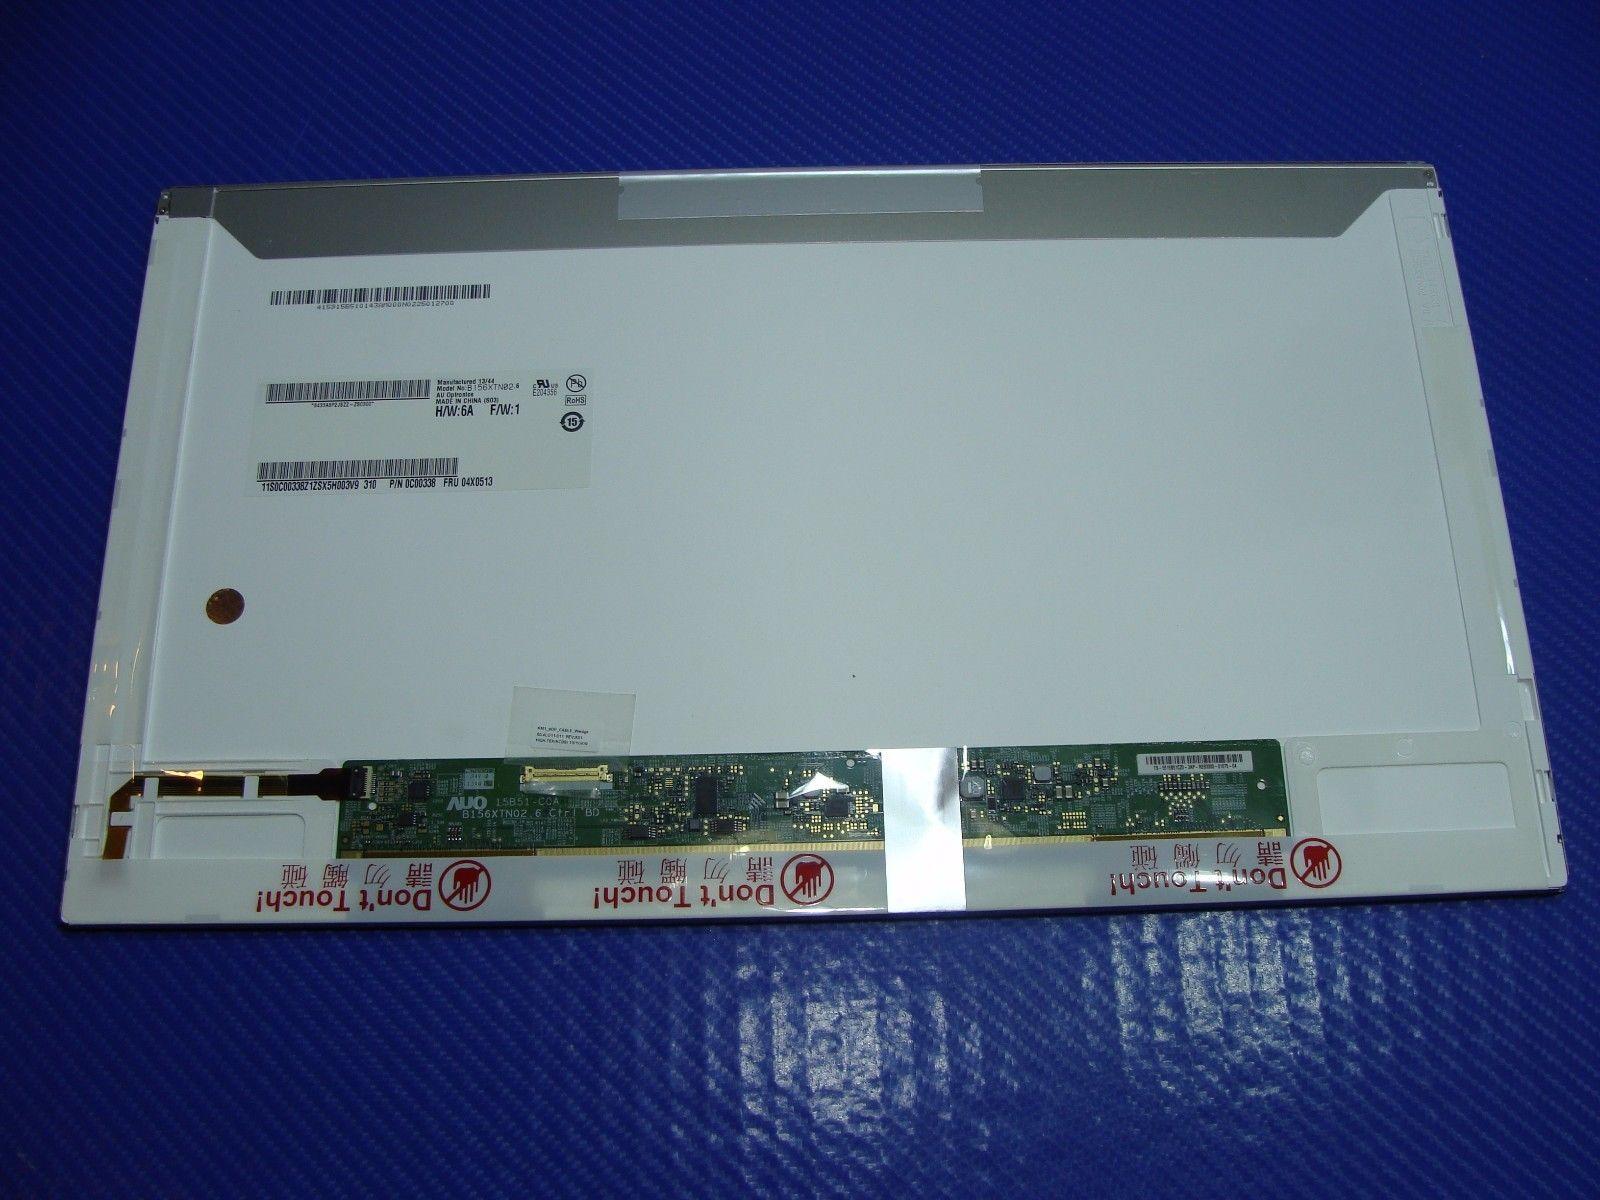 Matrix Panel LP156WH4 TP A1 LP156WH4 TPA1 LP156WH4 TPA1For Acer ASPIRE V3 551 EDP 1366 768